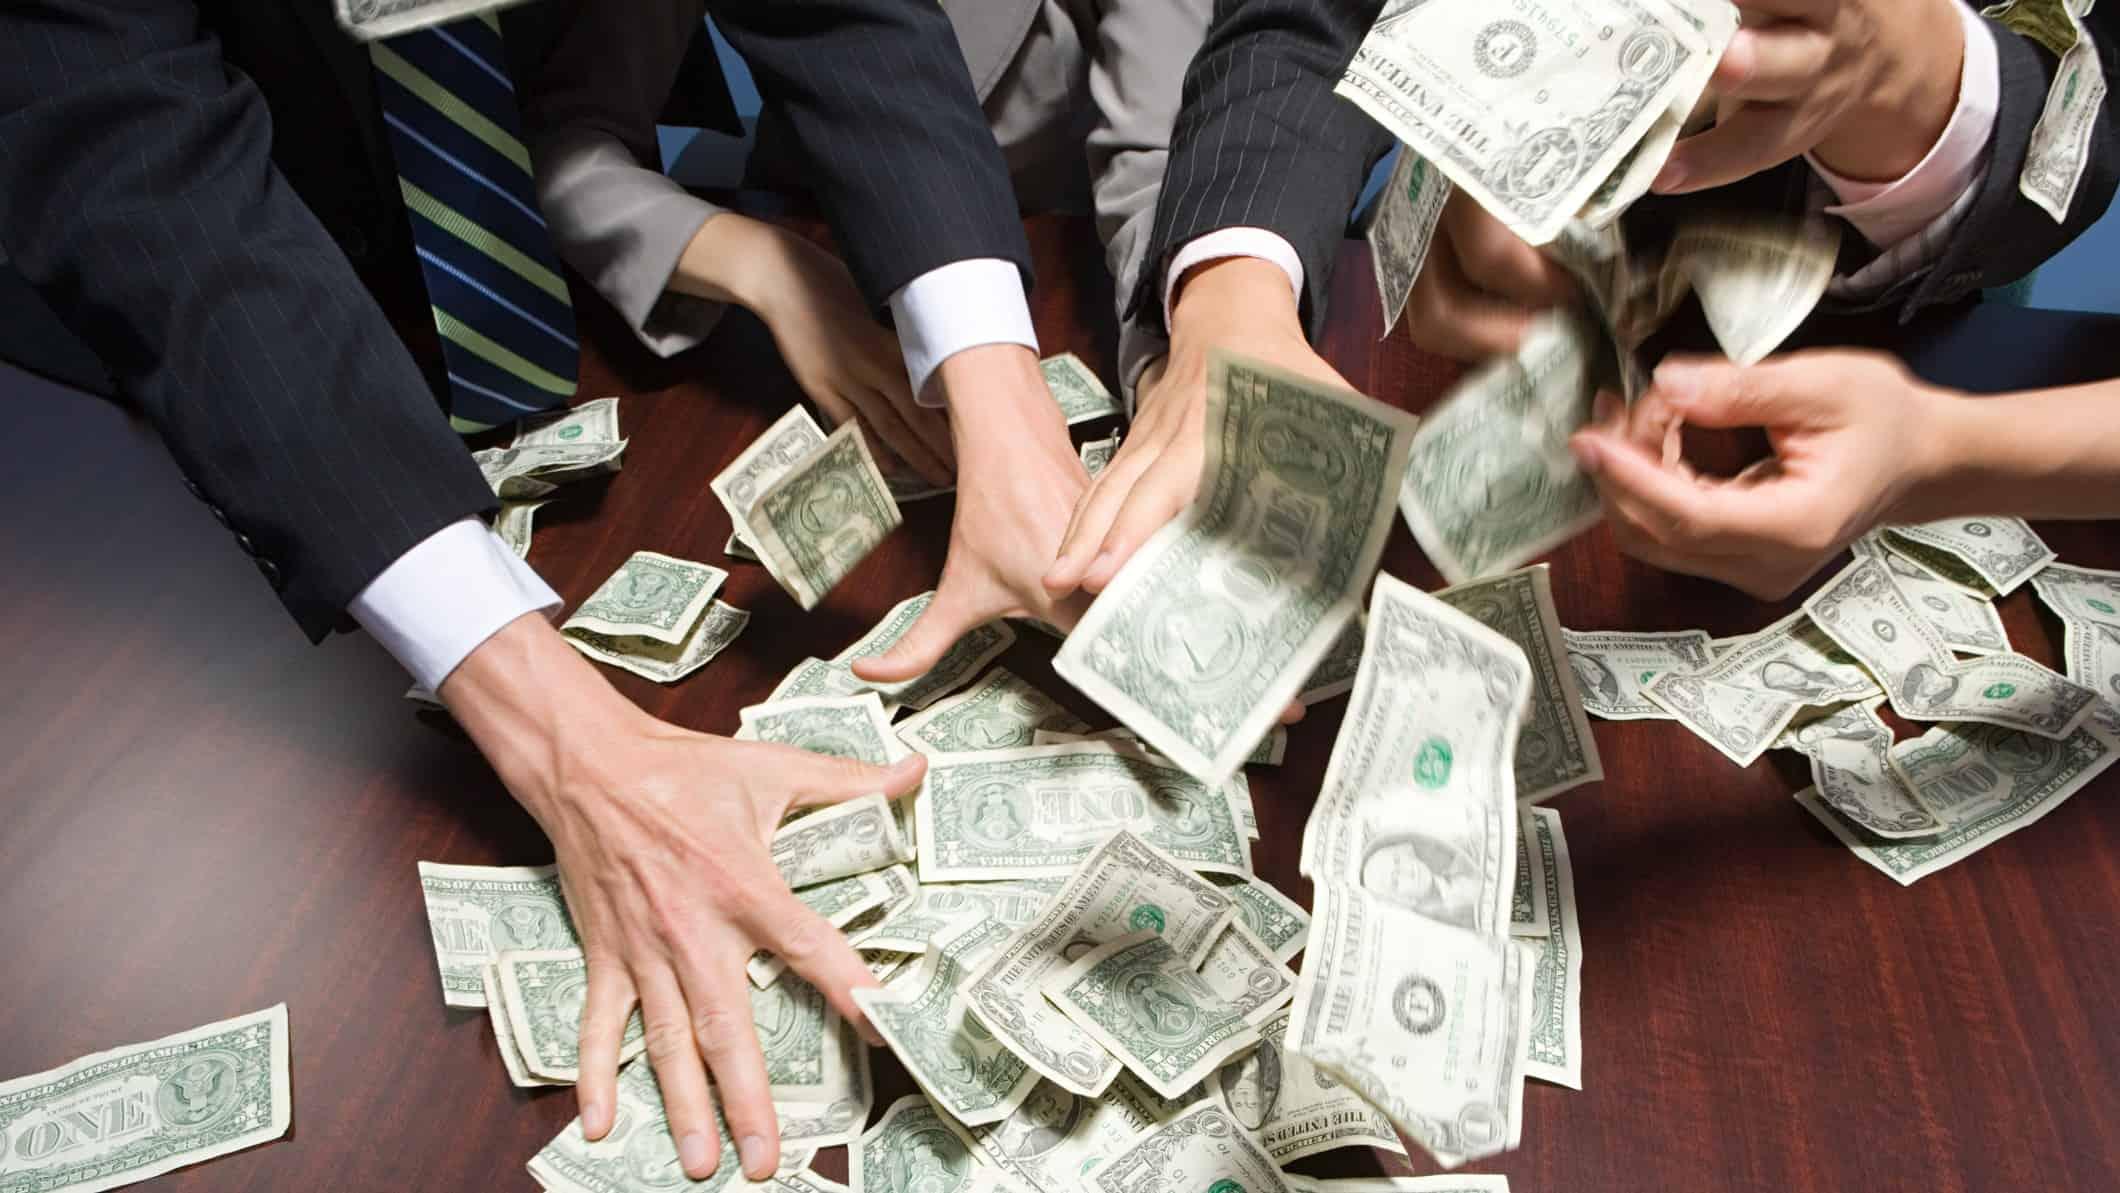 hands all grabbing at cash representing US shares